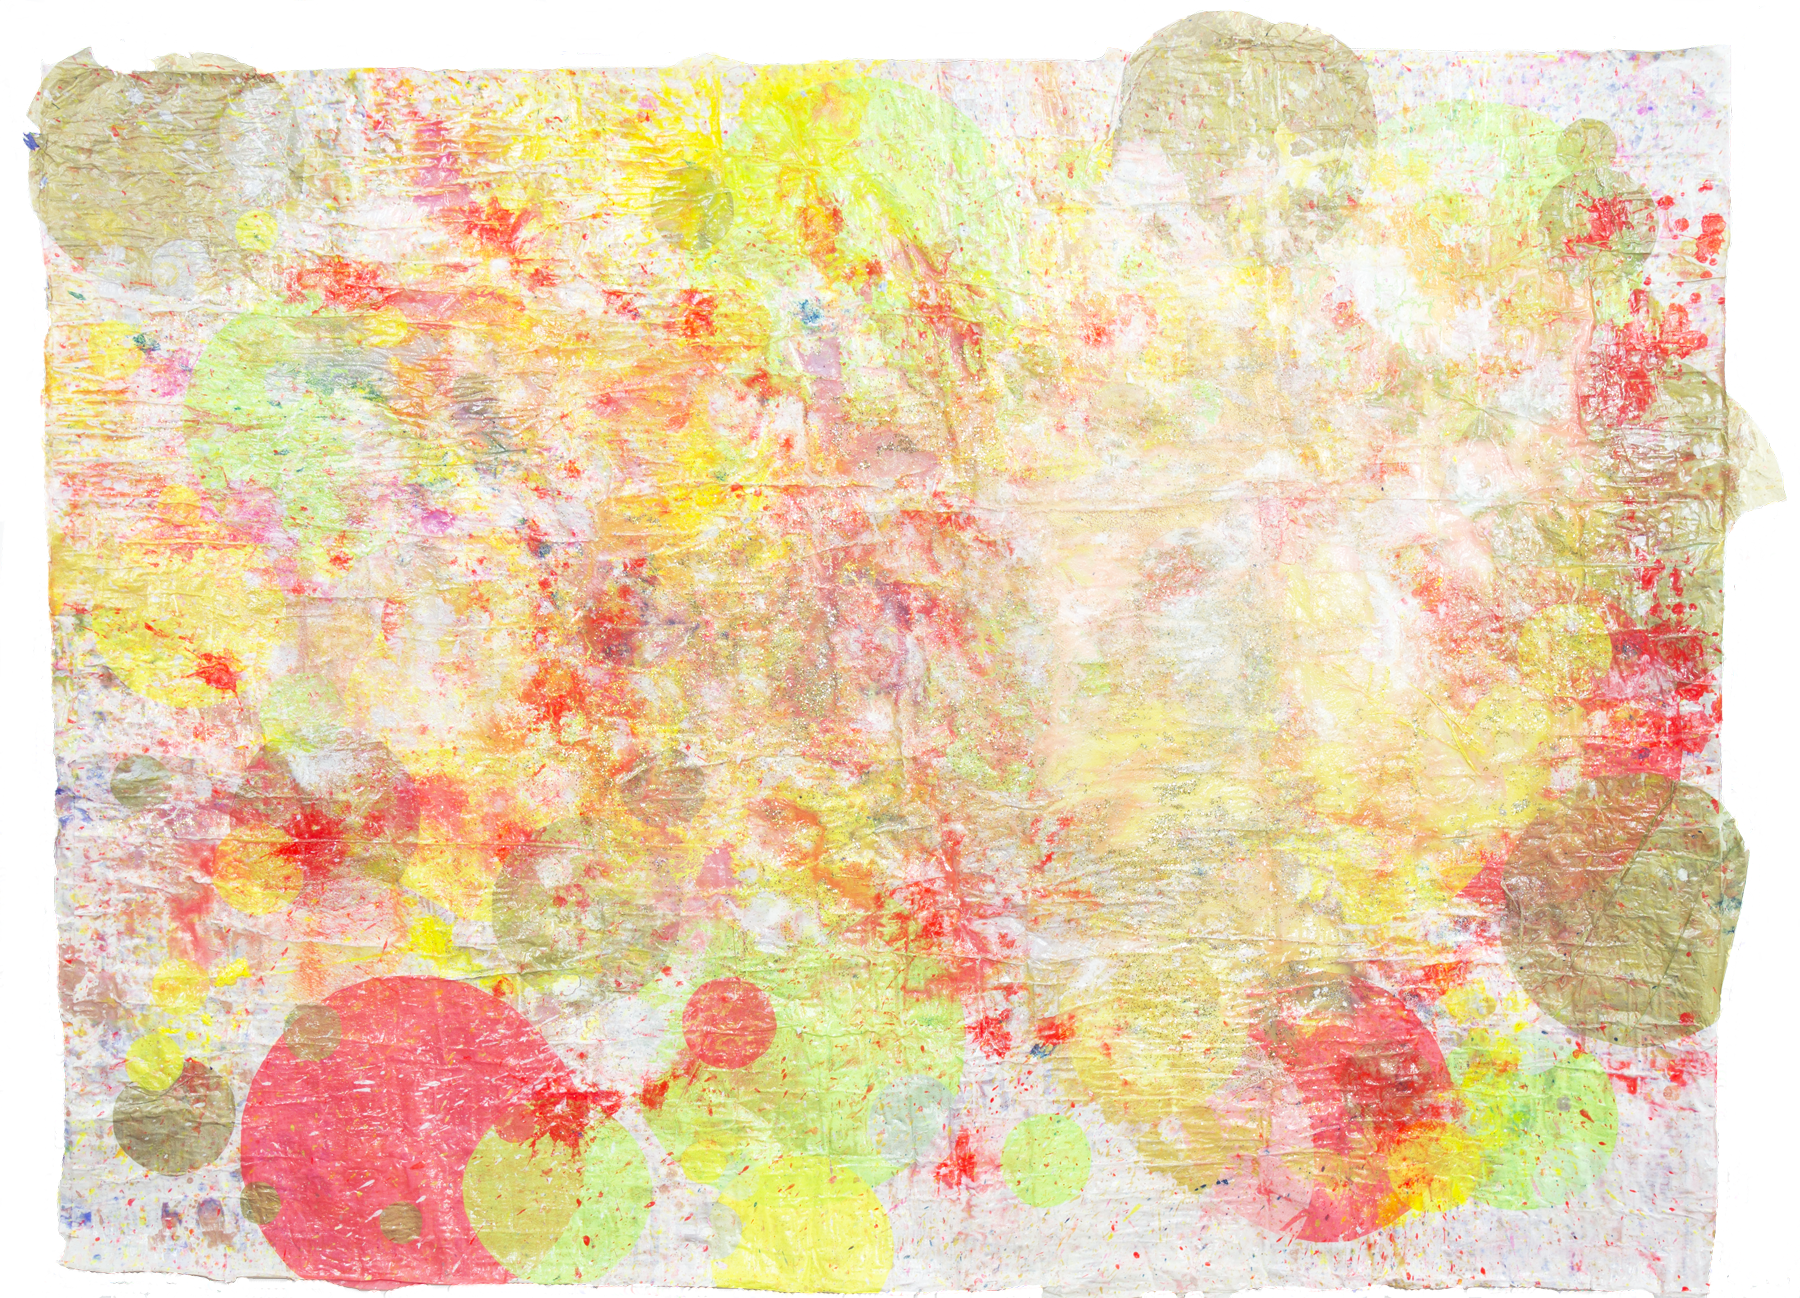 'Lumiverse NO. 6', 128 x 100 cm, acrylic paint and silk paper on a handmade paper-base. Kerstin Pressler, www.kerstinpressler.com